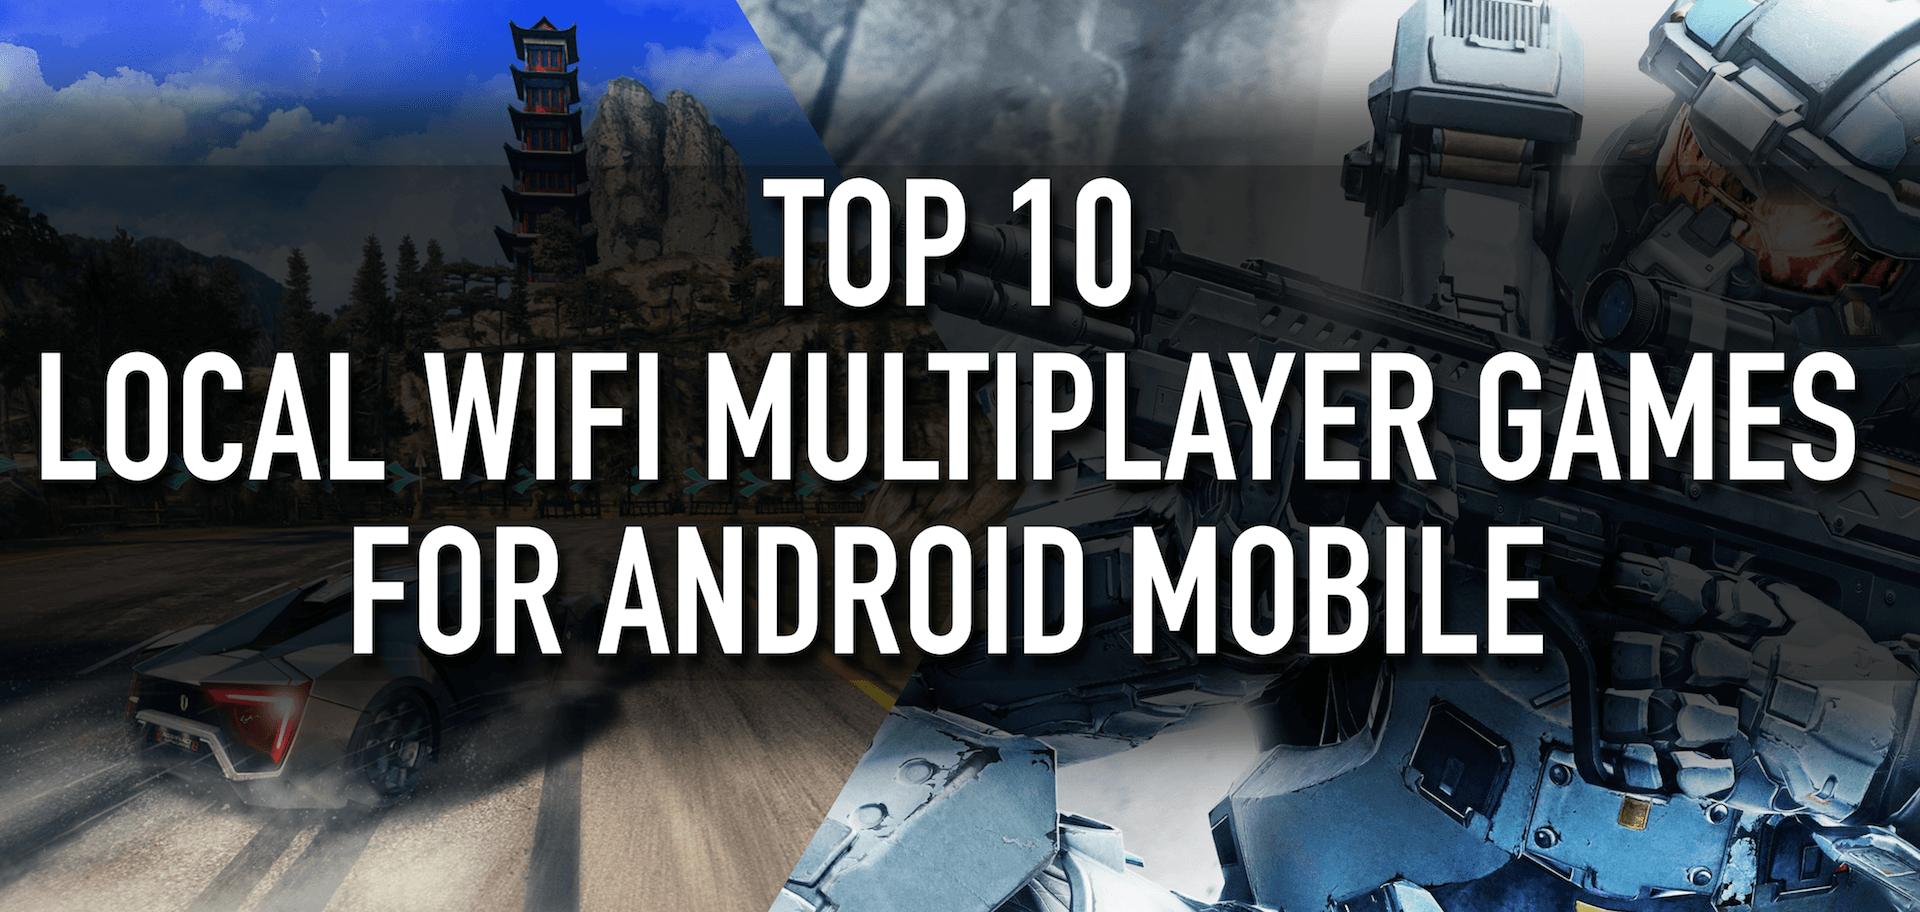 Top 10 Best Local WiFi Multiplayer(OfflineLAN) Games for